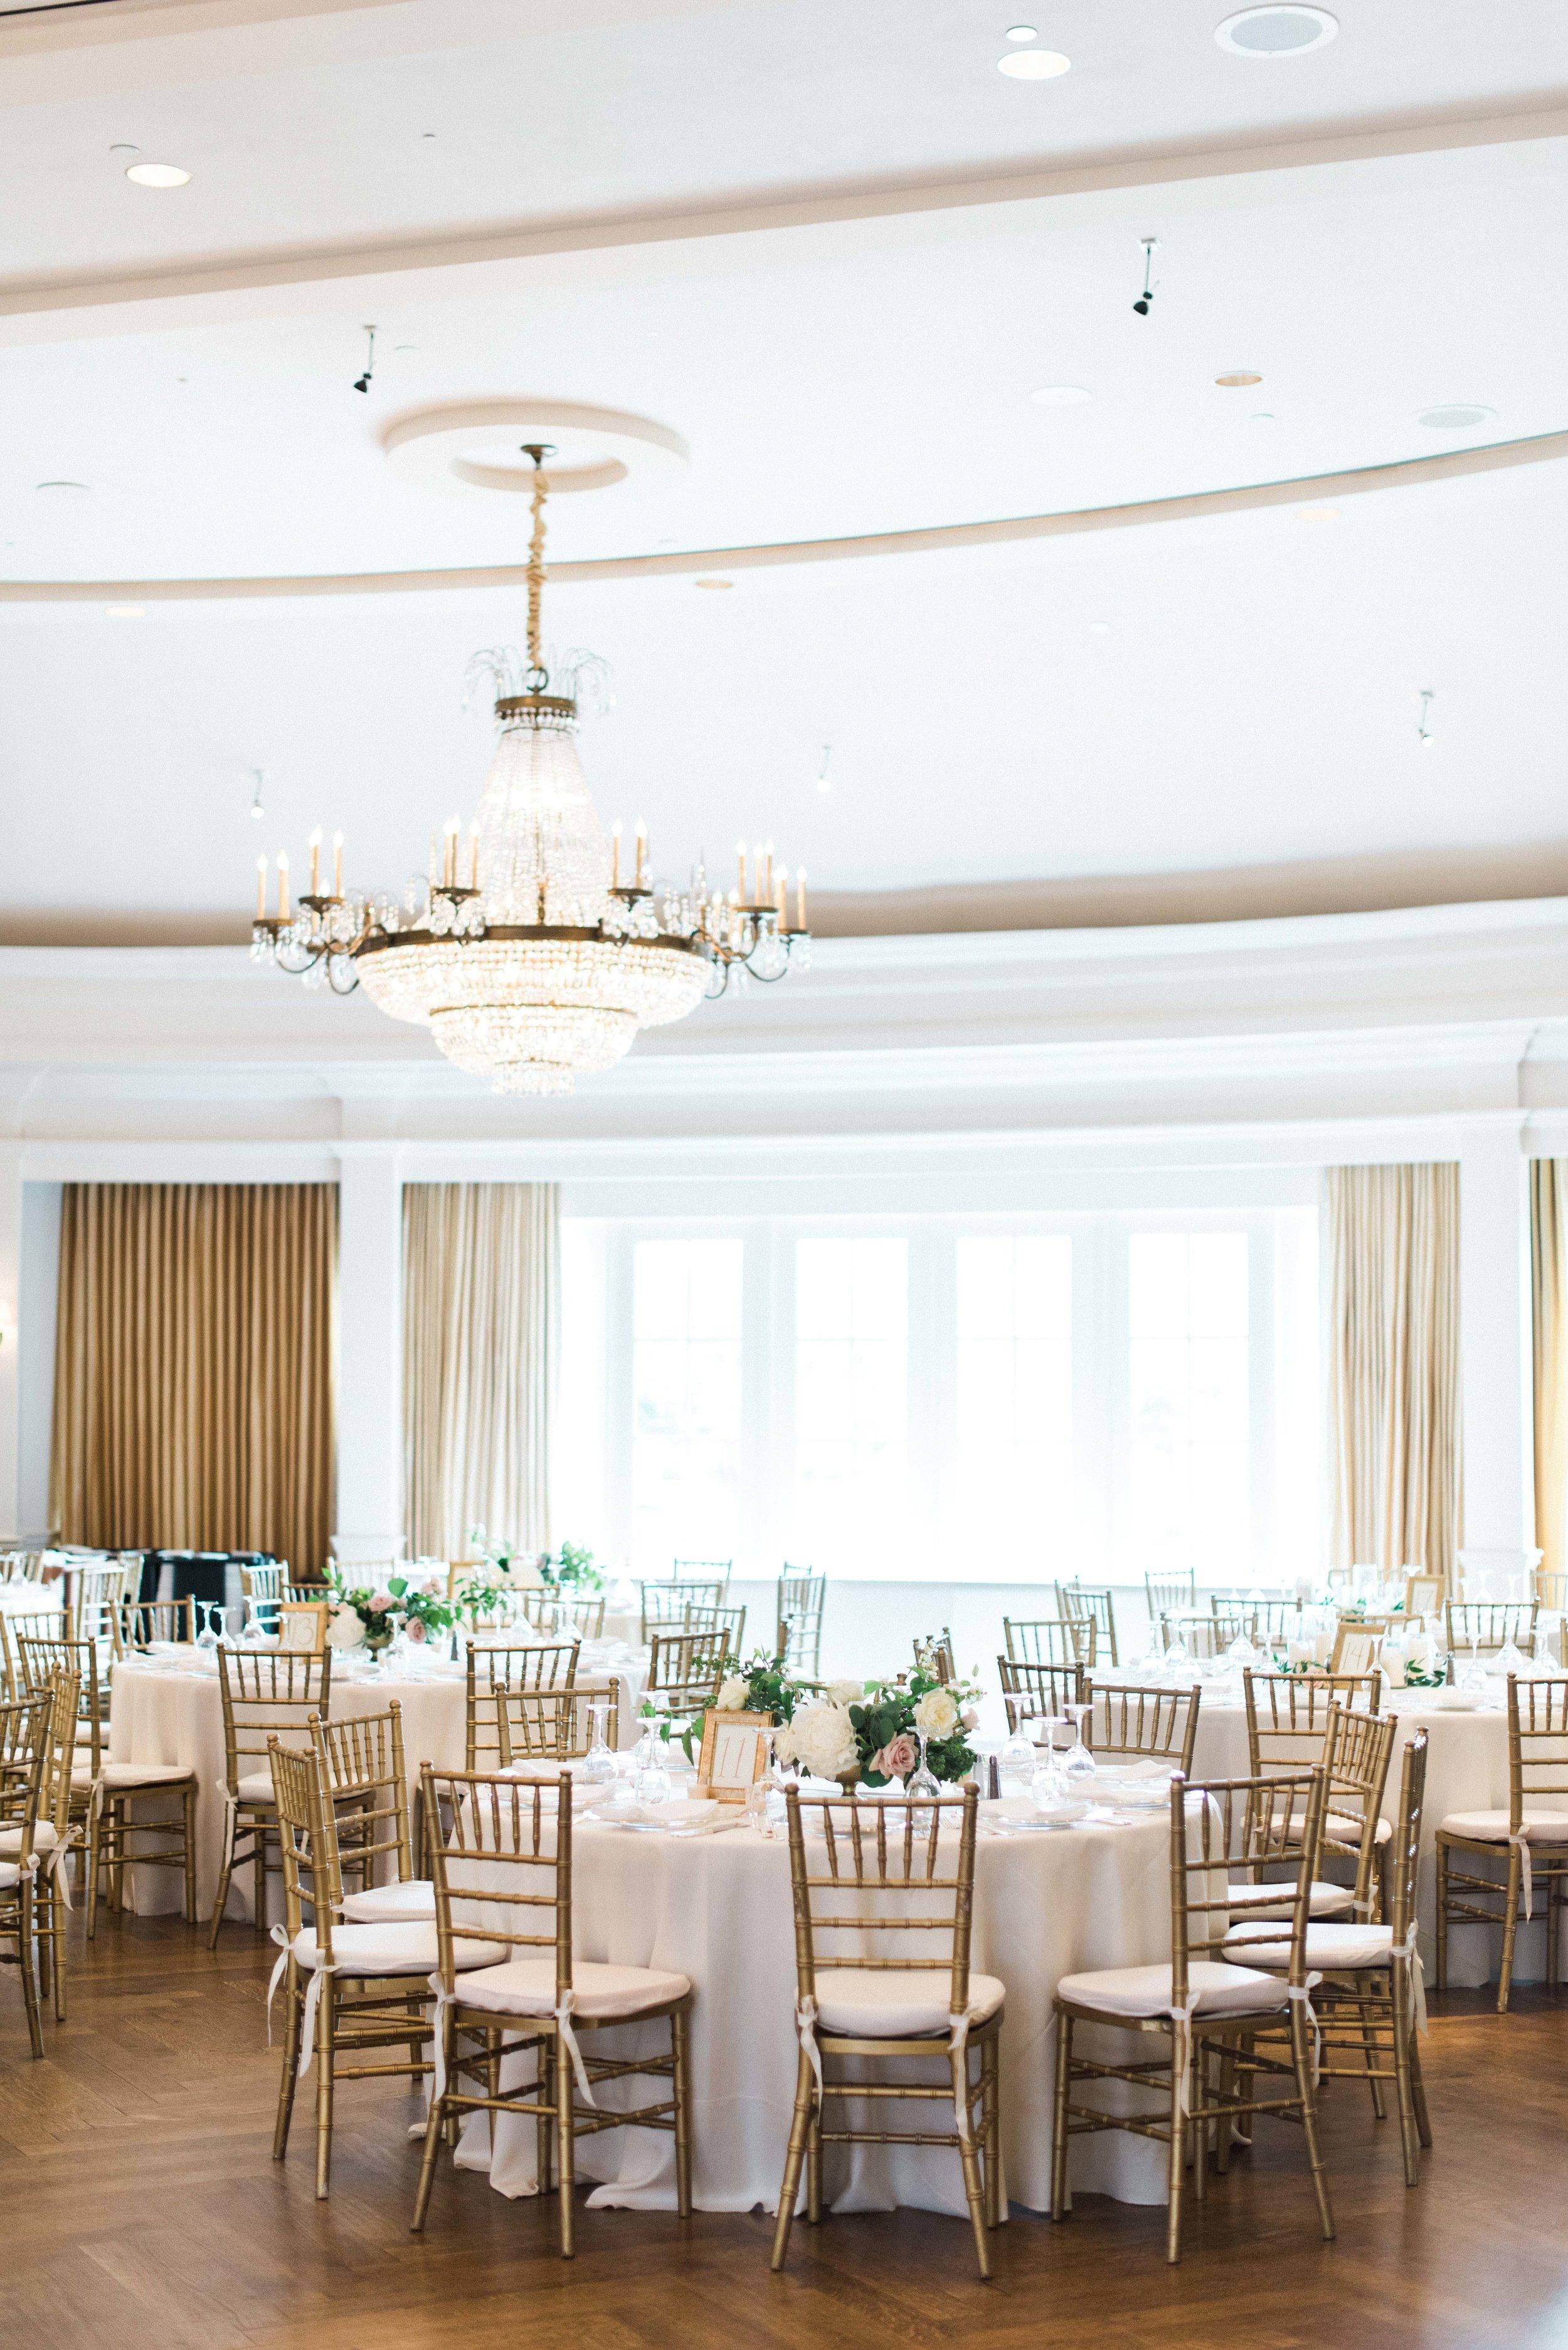 Fine-Art-Film-Houston-Wedding-Photographer-Best-Top-Luxury-Texas-Austin-Dallas-Destination-Dana-Fernandez-Photography-River-Oaks-Country-Club-South-Main-Baptist-Ceremony-Reception-Wedding-13.jpg